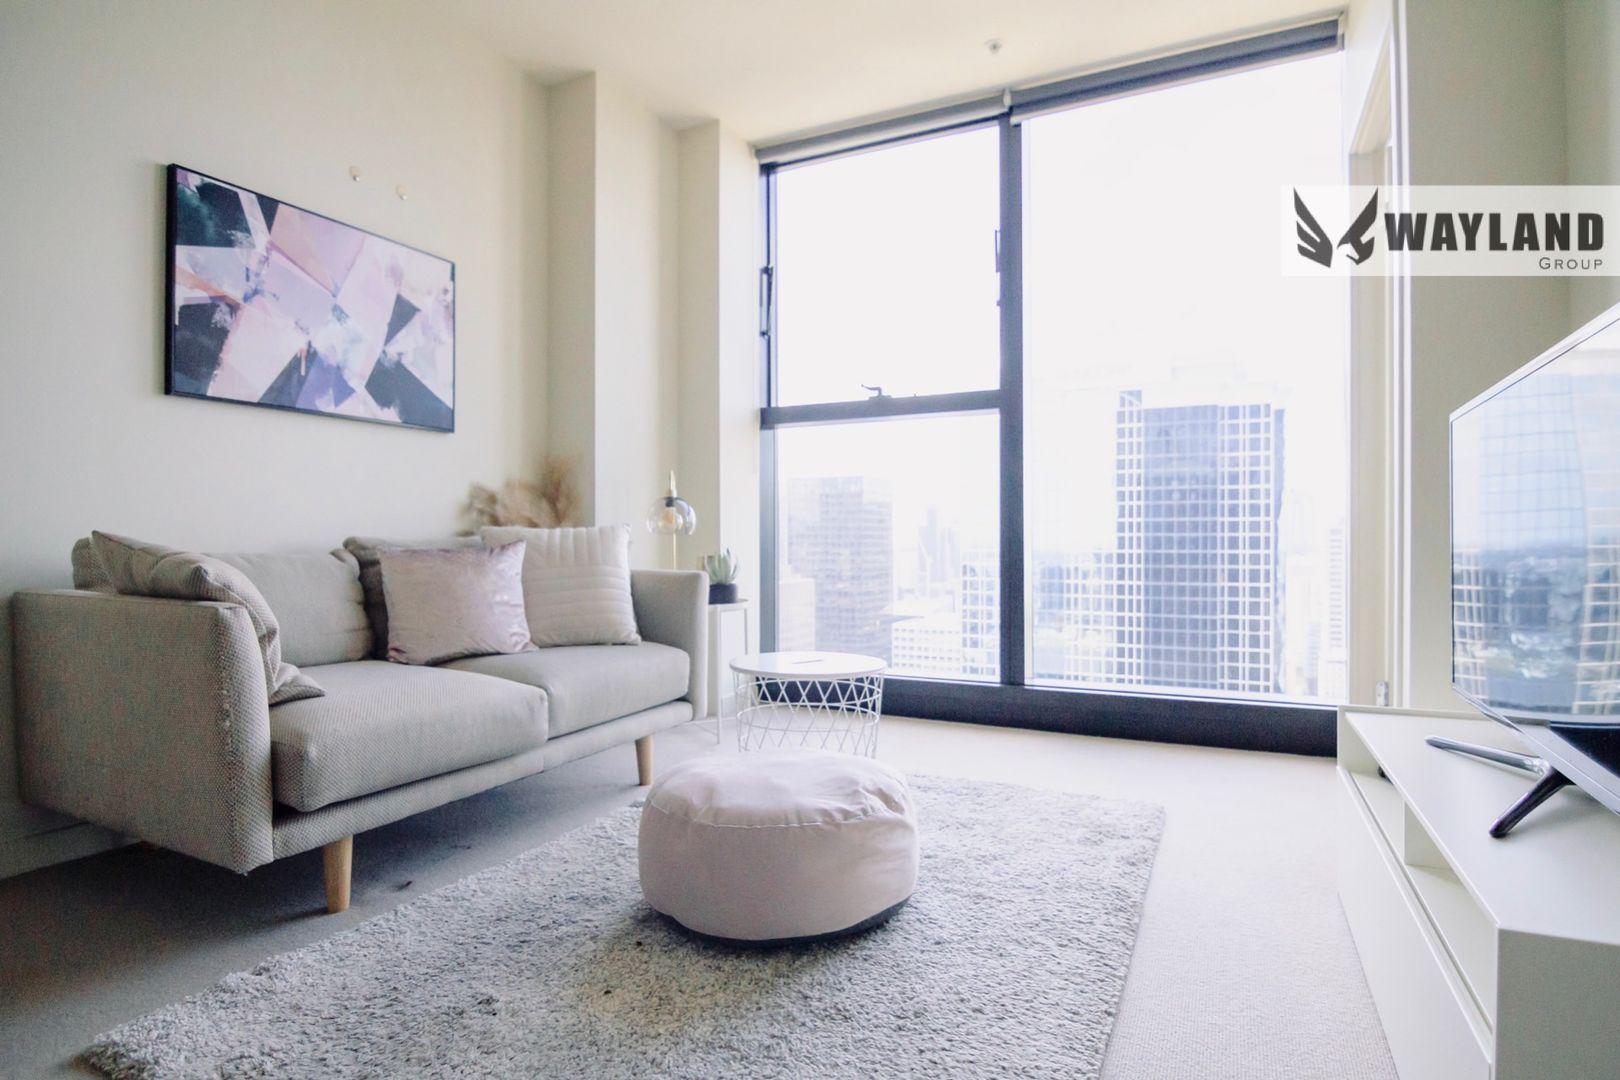 2 bedrooms Apartment / Unit / Flat in 4203/568 Collins St MELBOURNE VIC, 3000